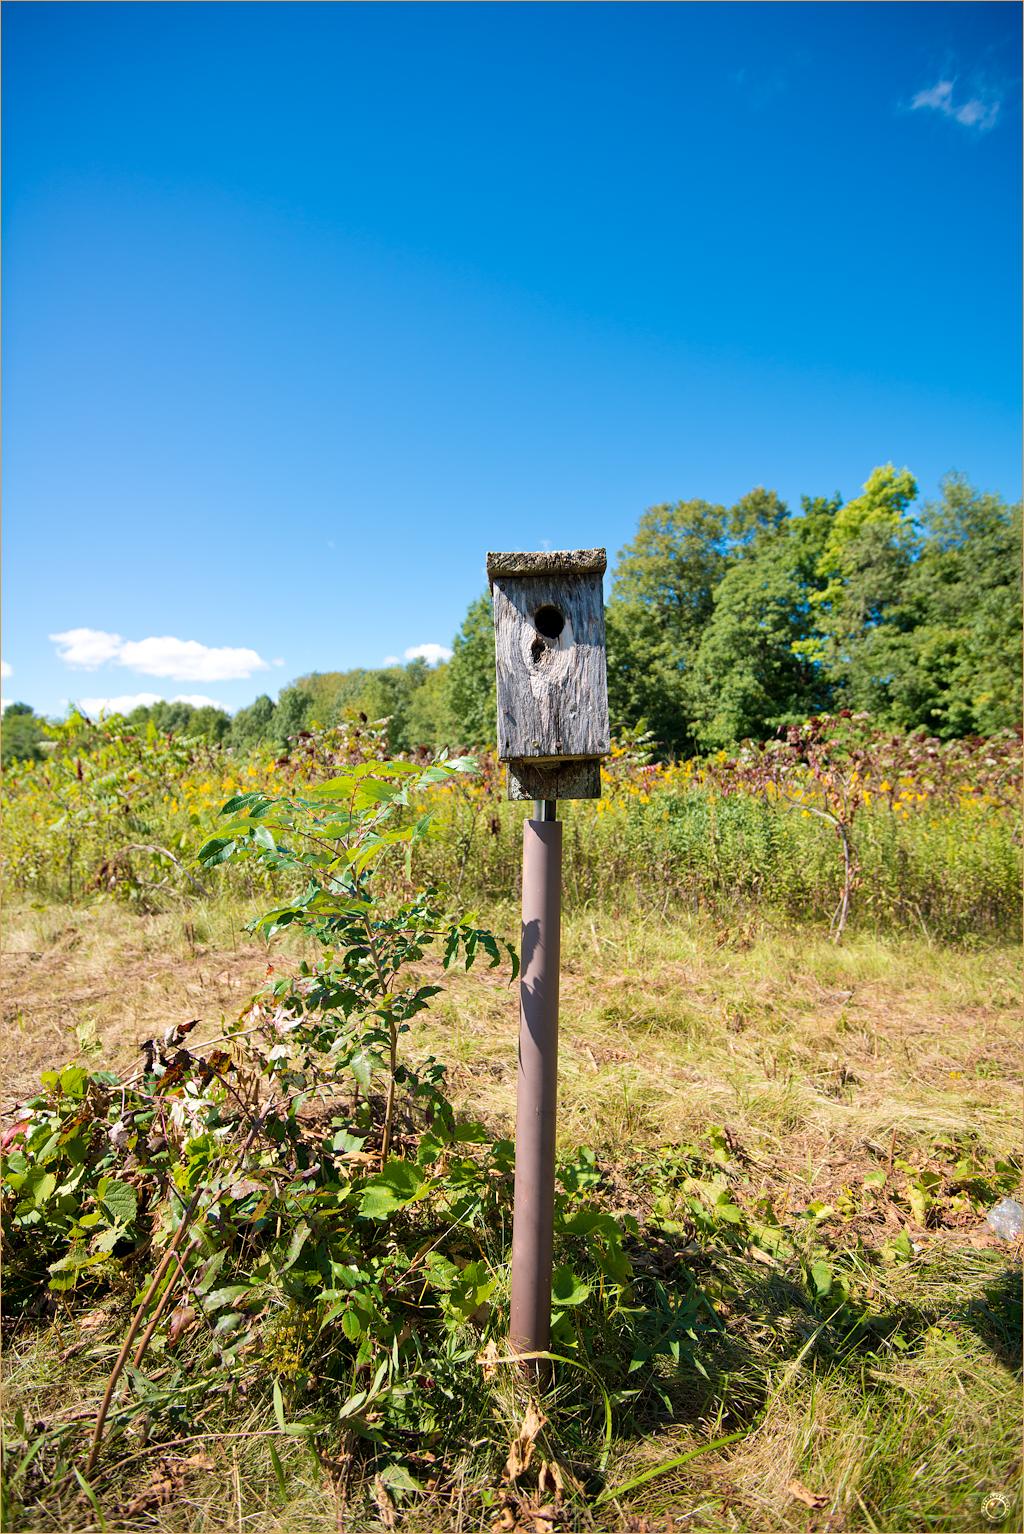 180 Wyalusing State Park Birdhouse